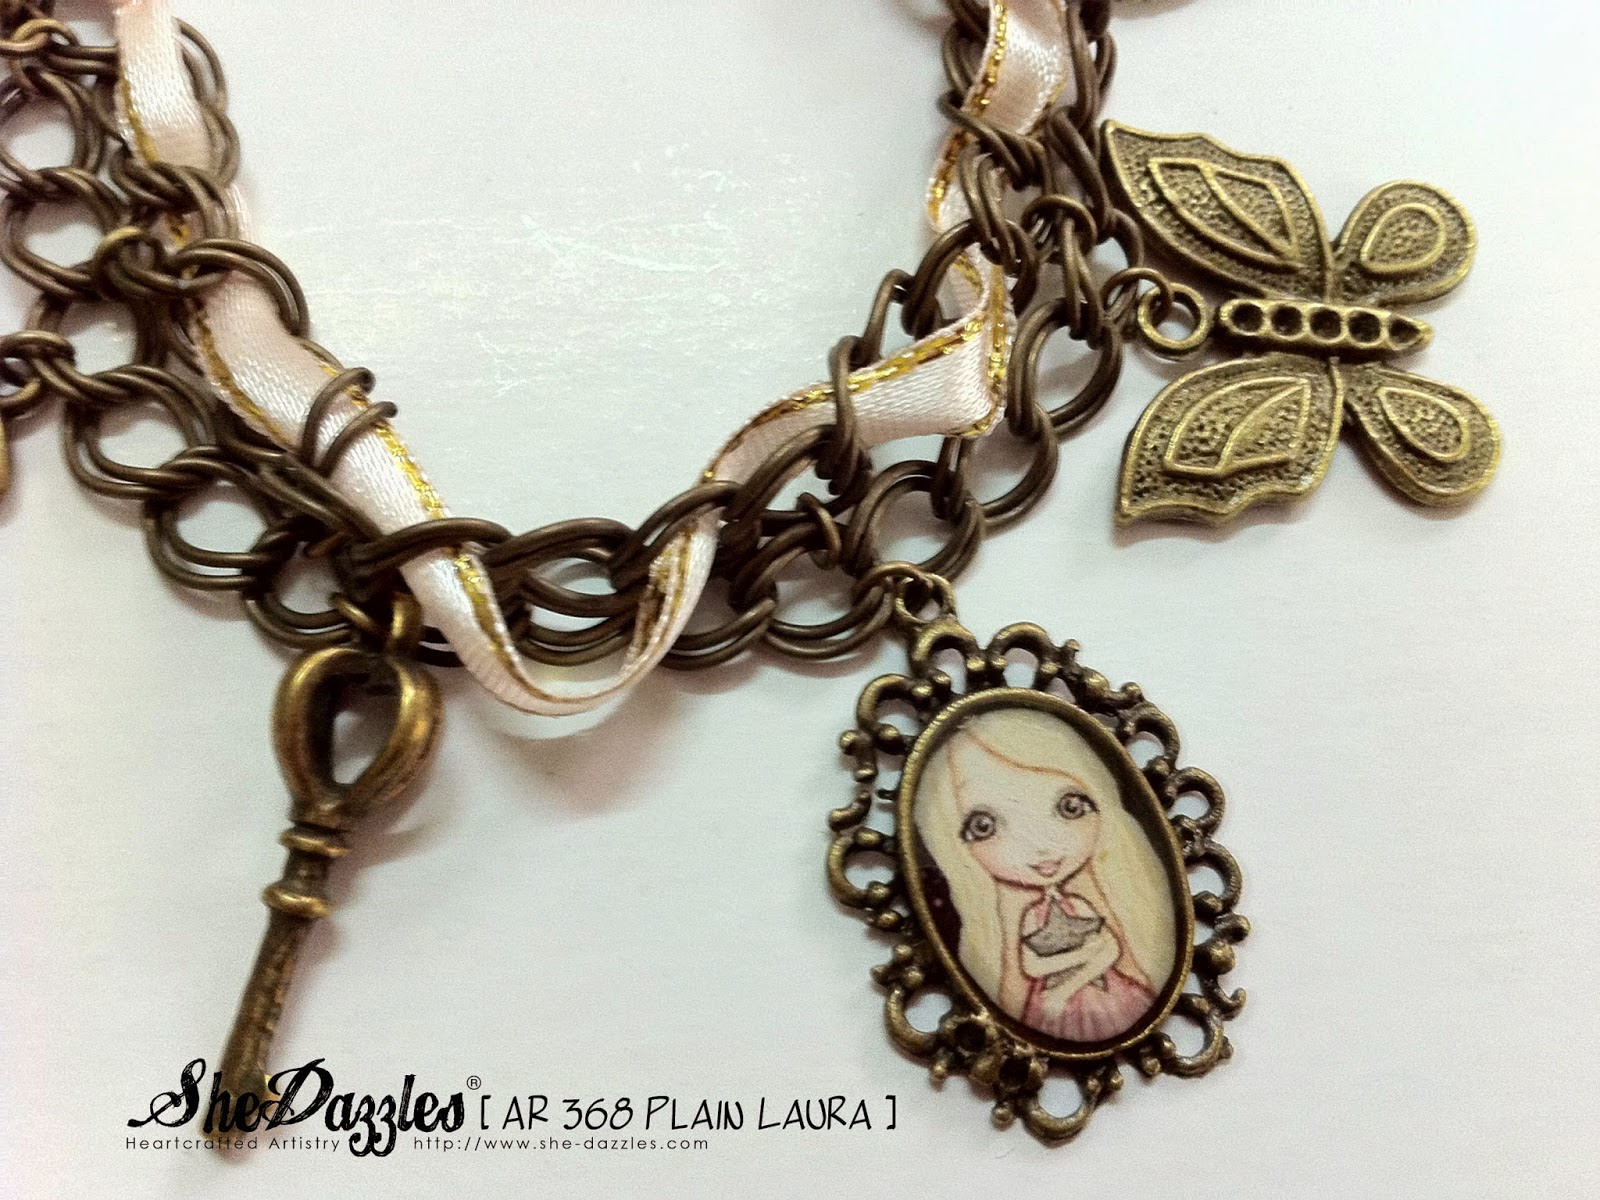 charm-bracelet-pastel-pink-white-shedazzles-malaysia